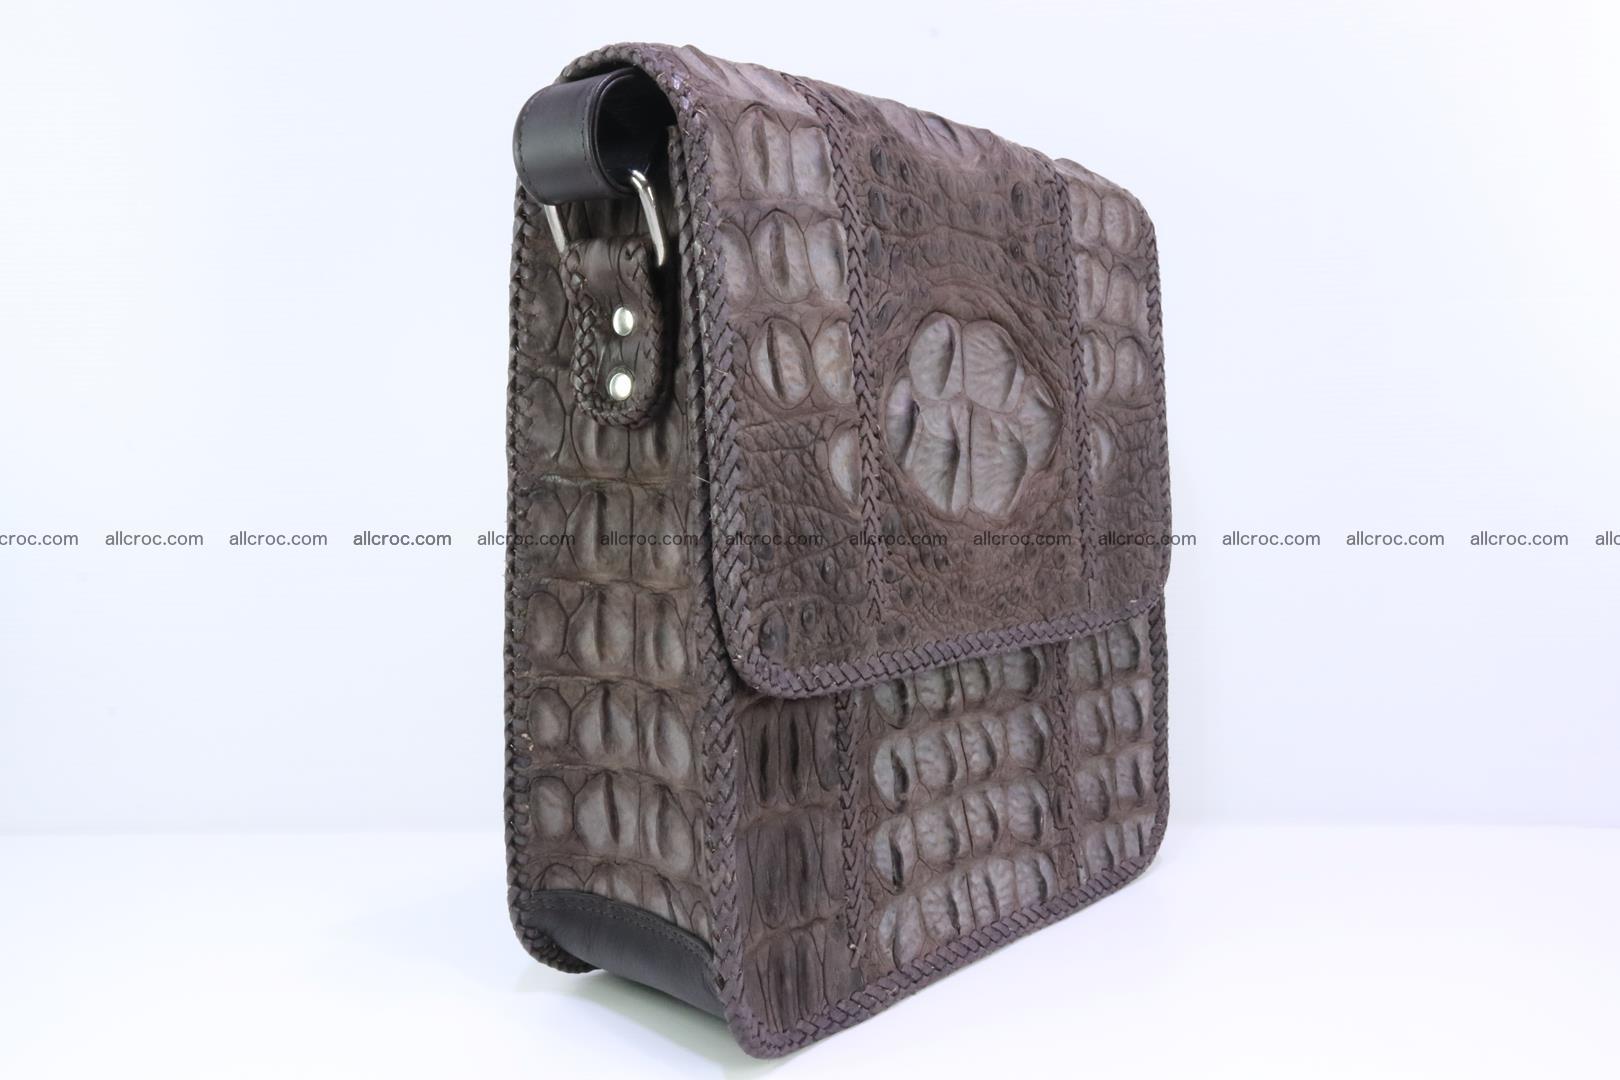 Сrocodile skin shoulder bag with braided edges 142 Foto 1